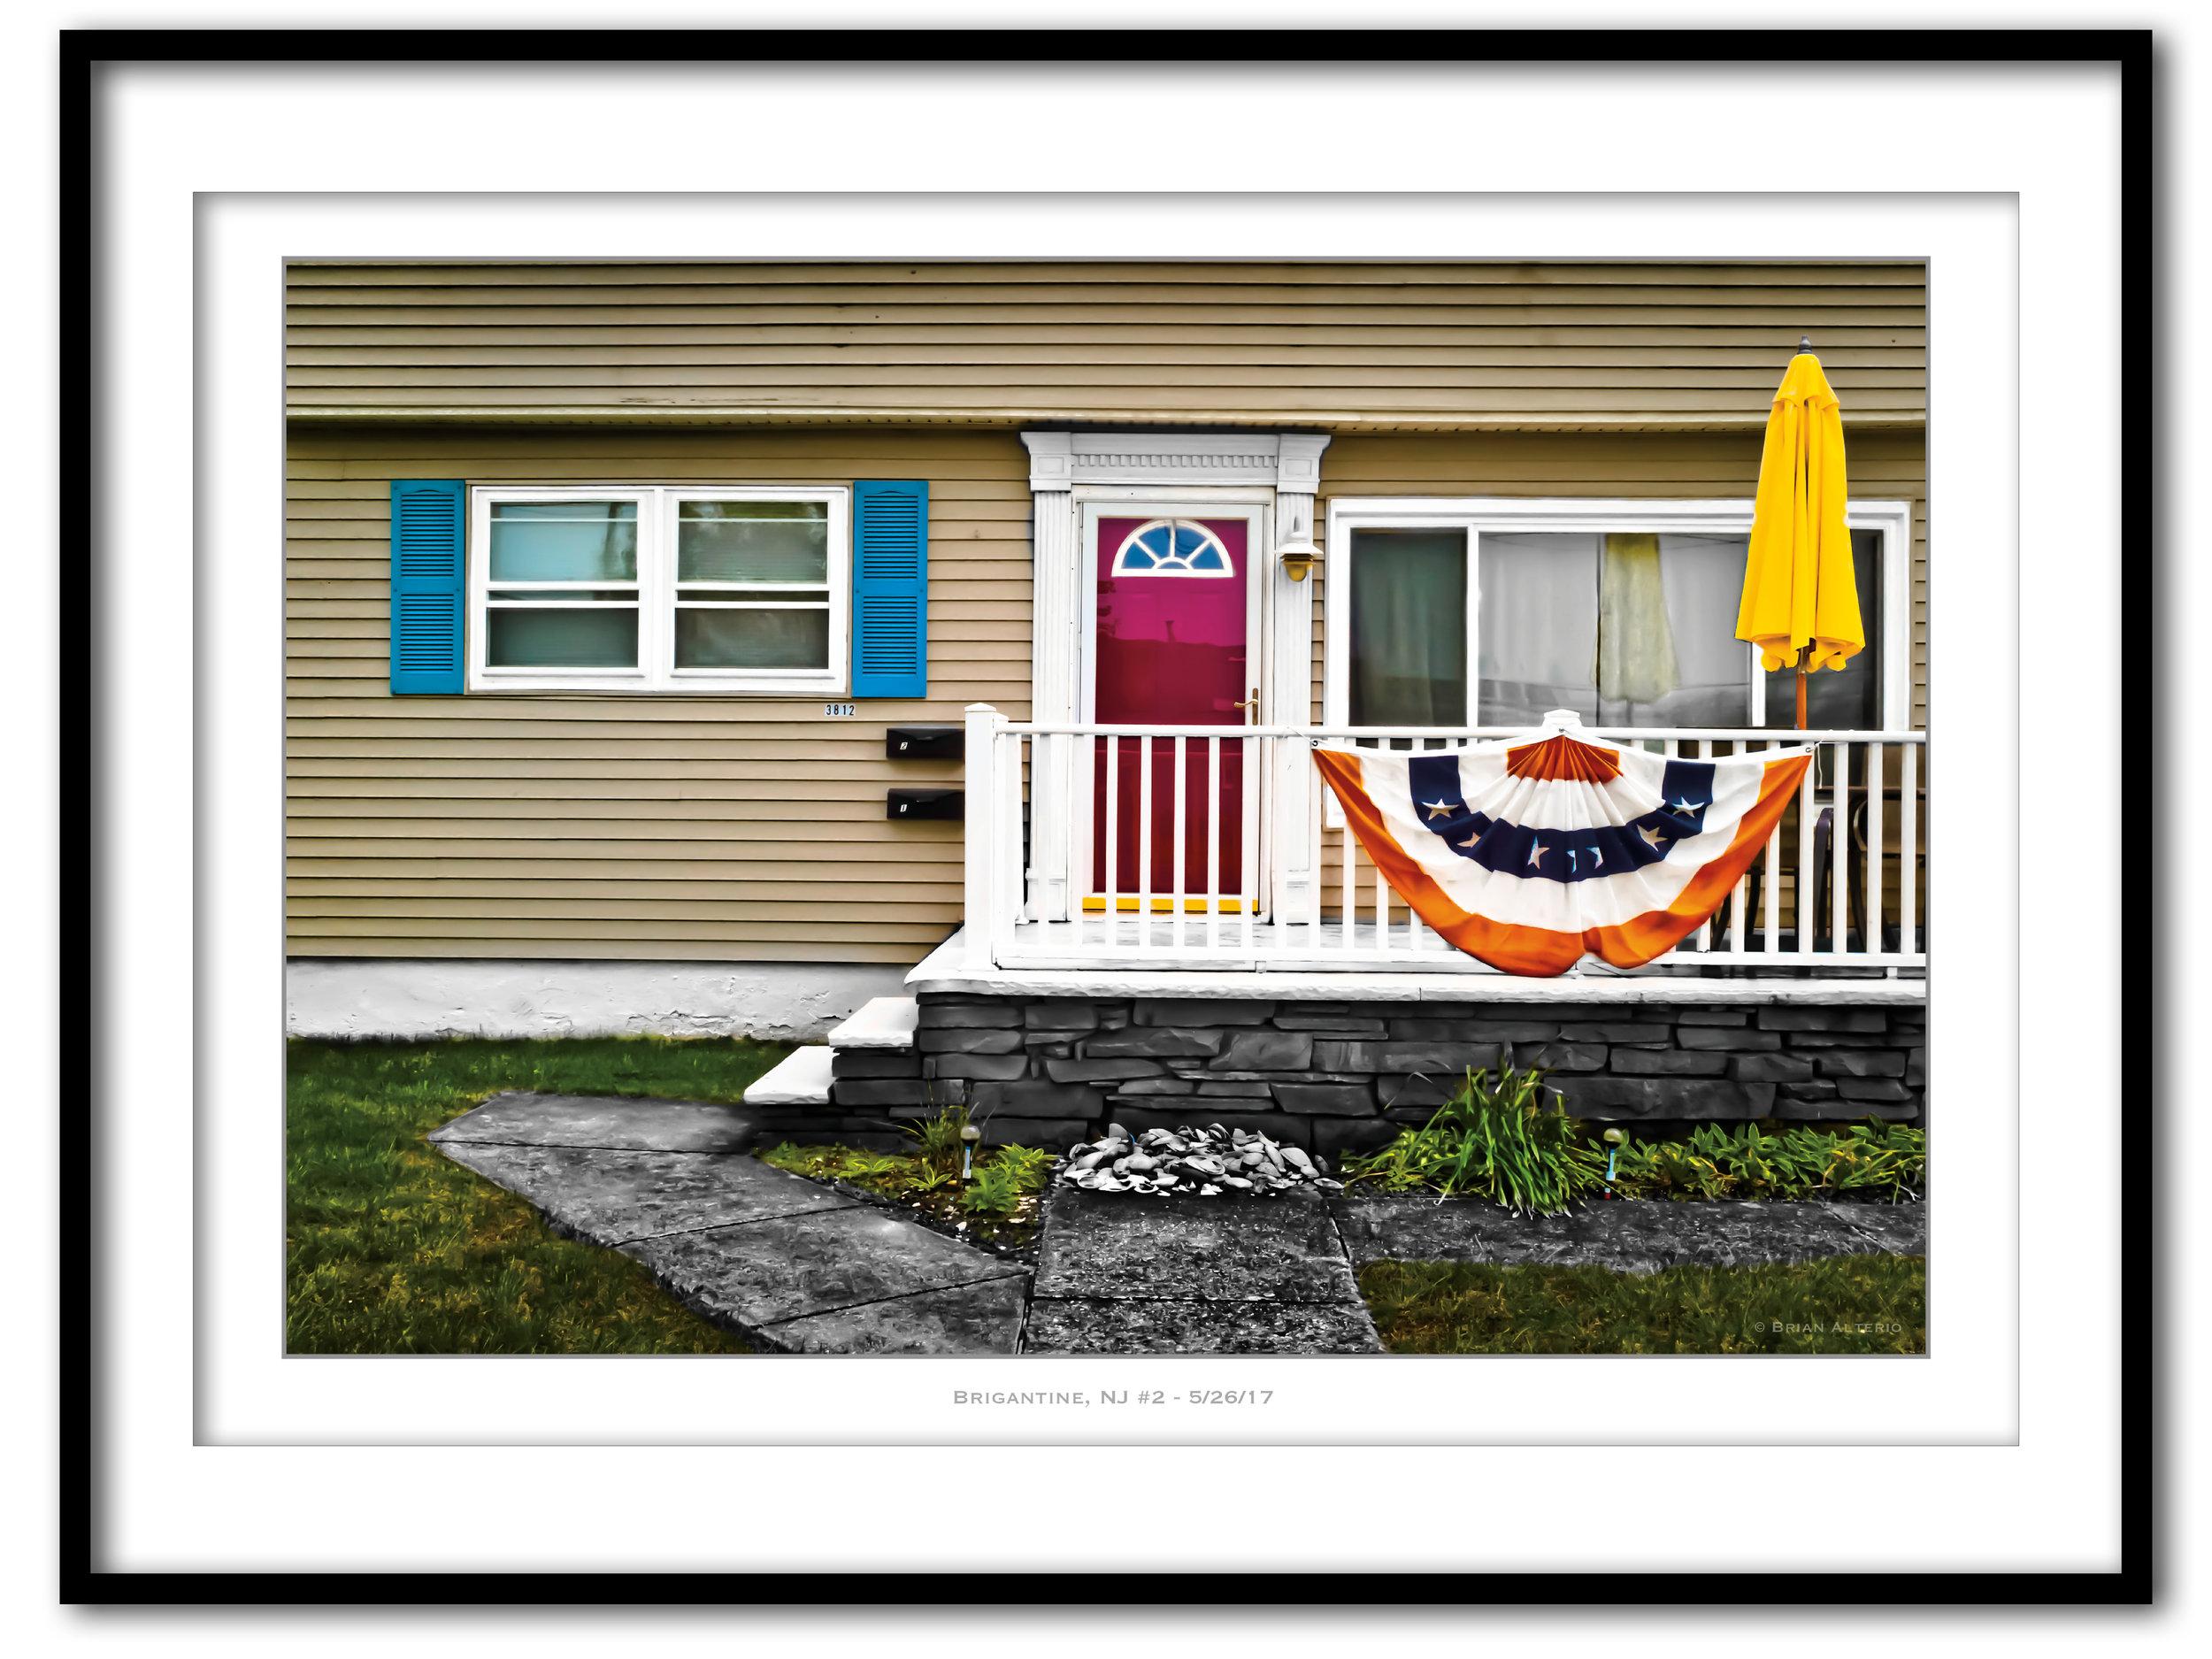 Brigantine, NJ #2 - 5-26-17 - Framed.jpg